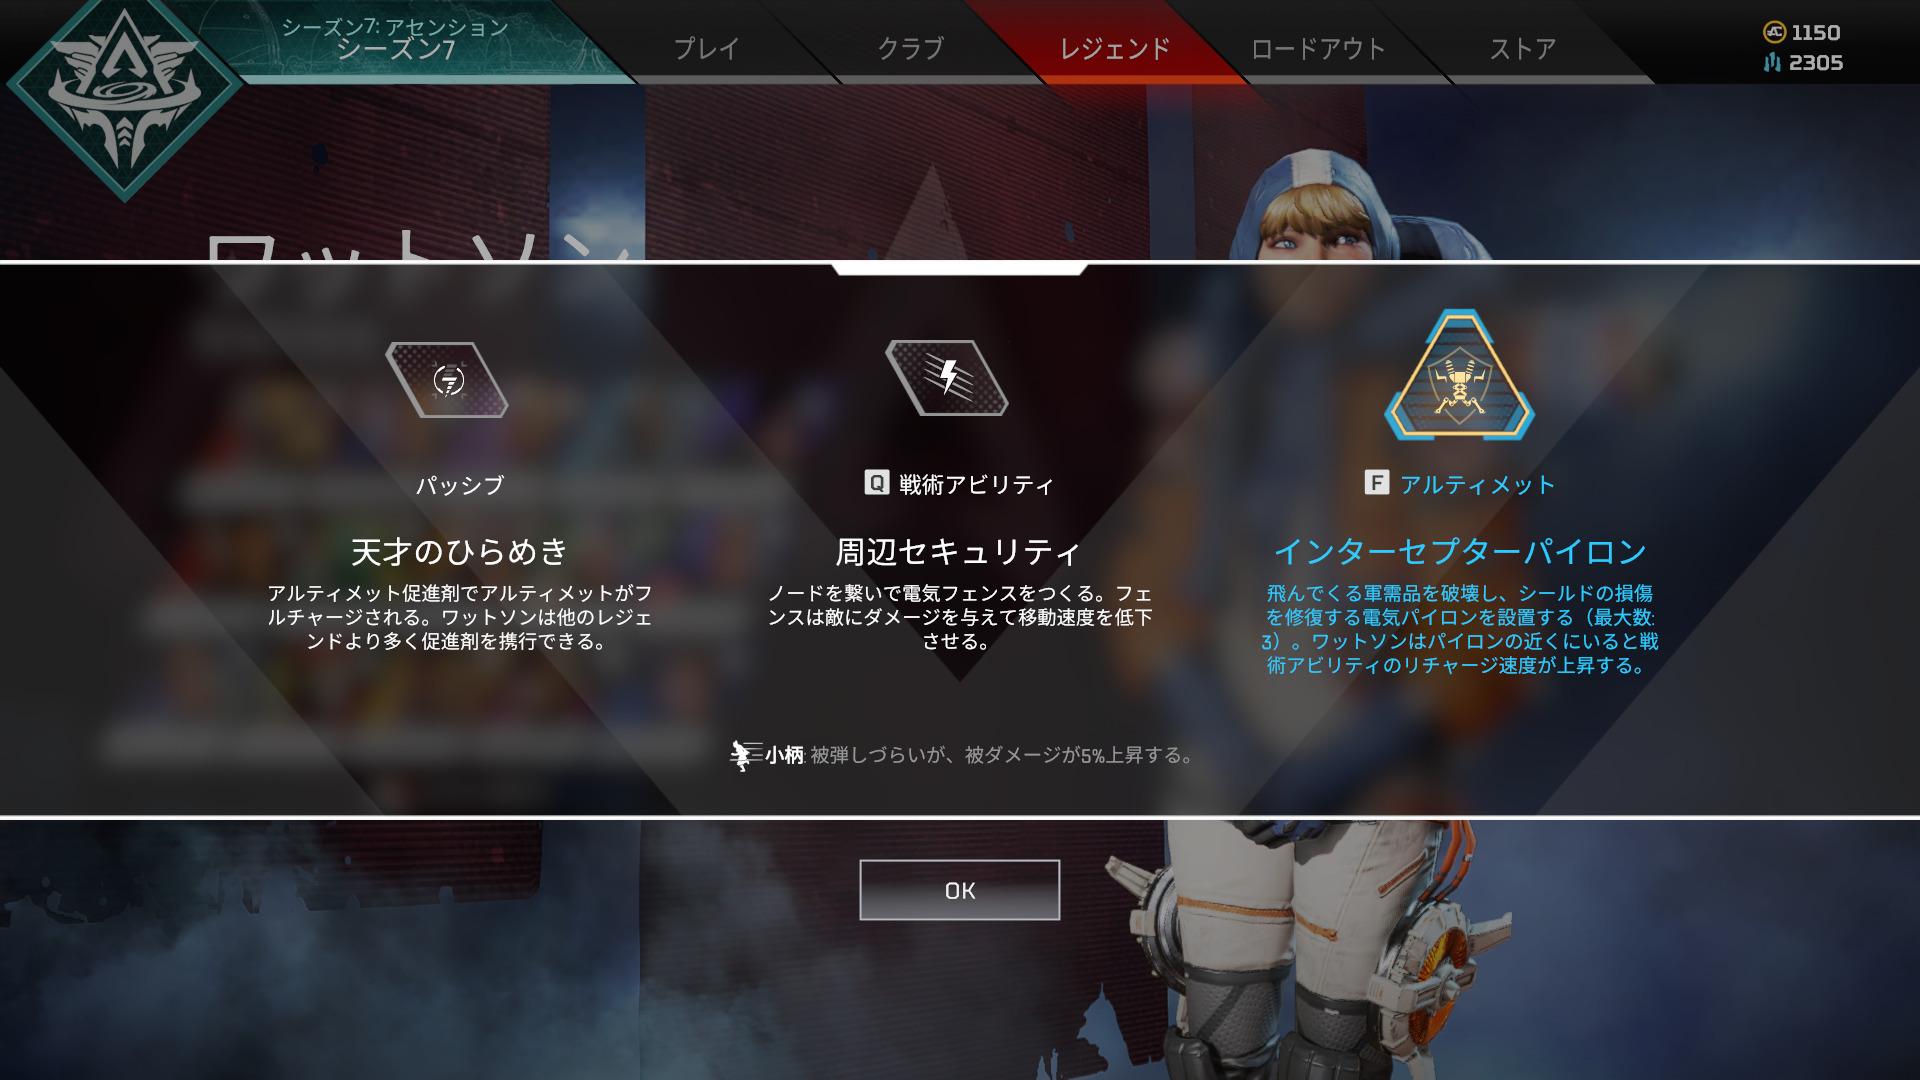 【Apex Legends】ワットソン 日本語セリフ一覧【基本ボイス】【エーペックスレジェンズ】